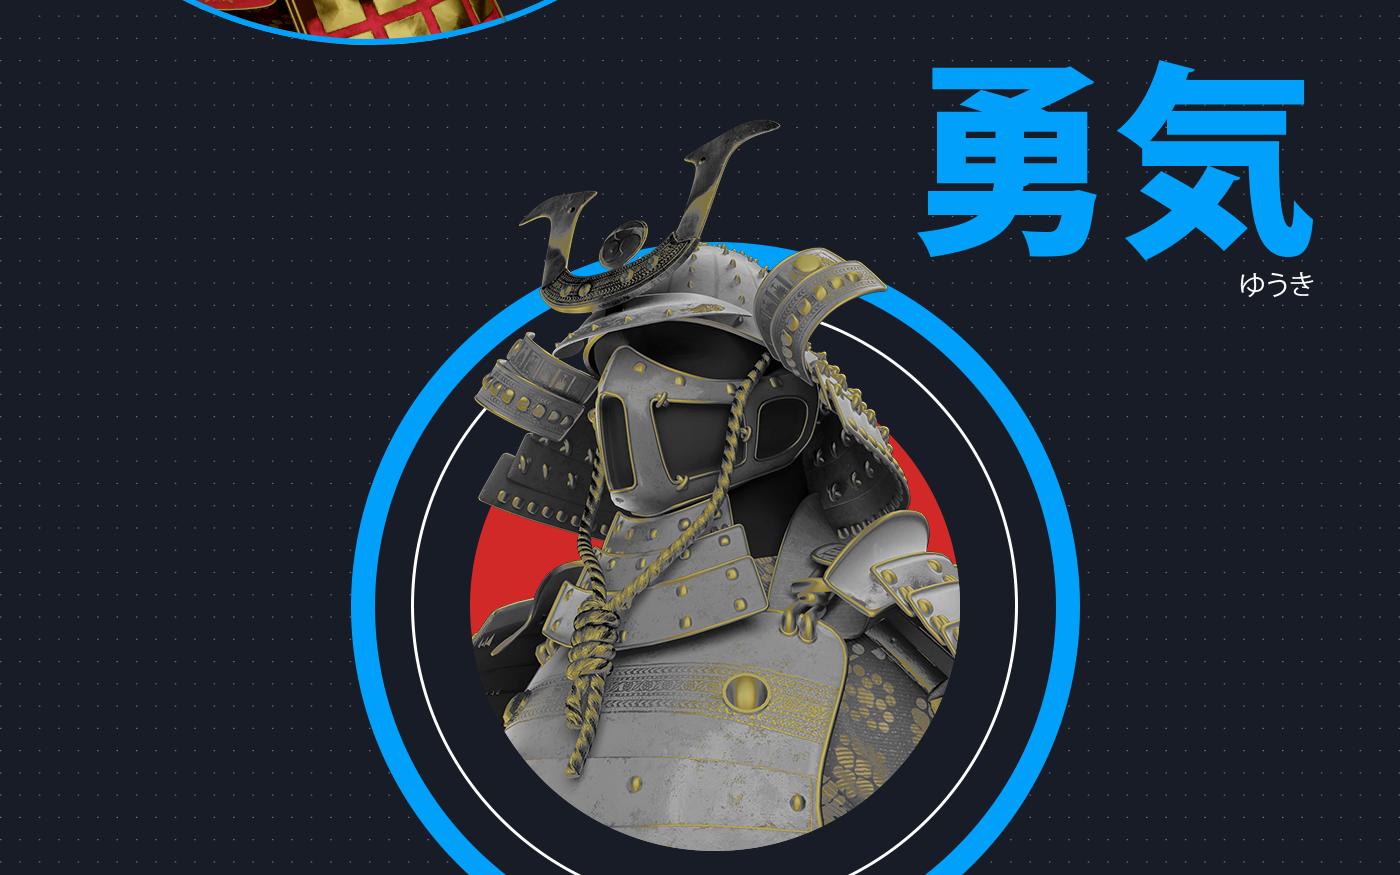 3D Modelling Texturization vfx resolume VJ samurai 3d animation blender short movie japan